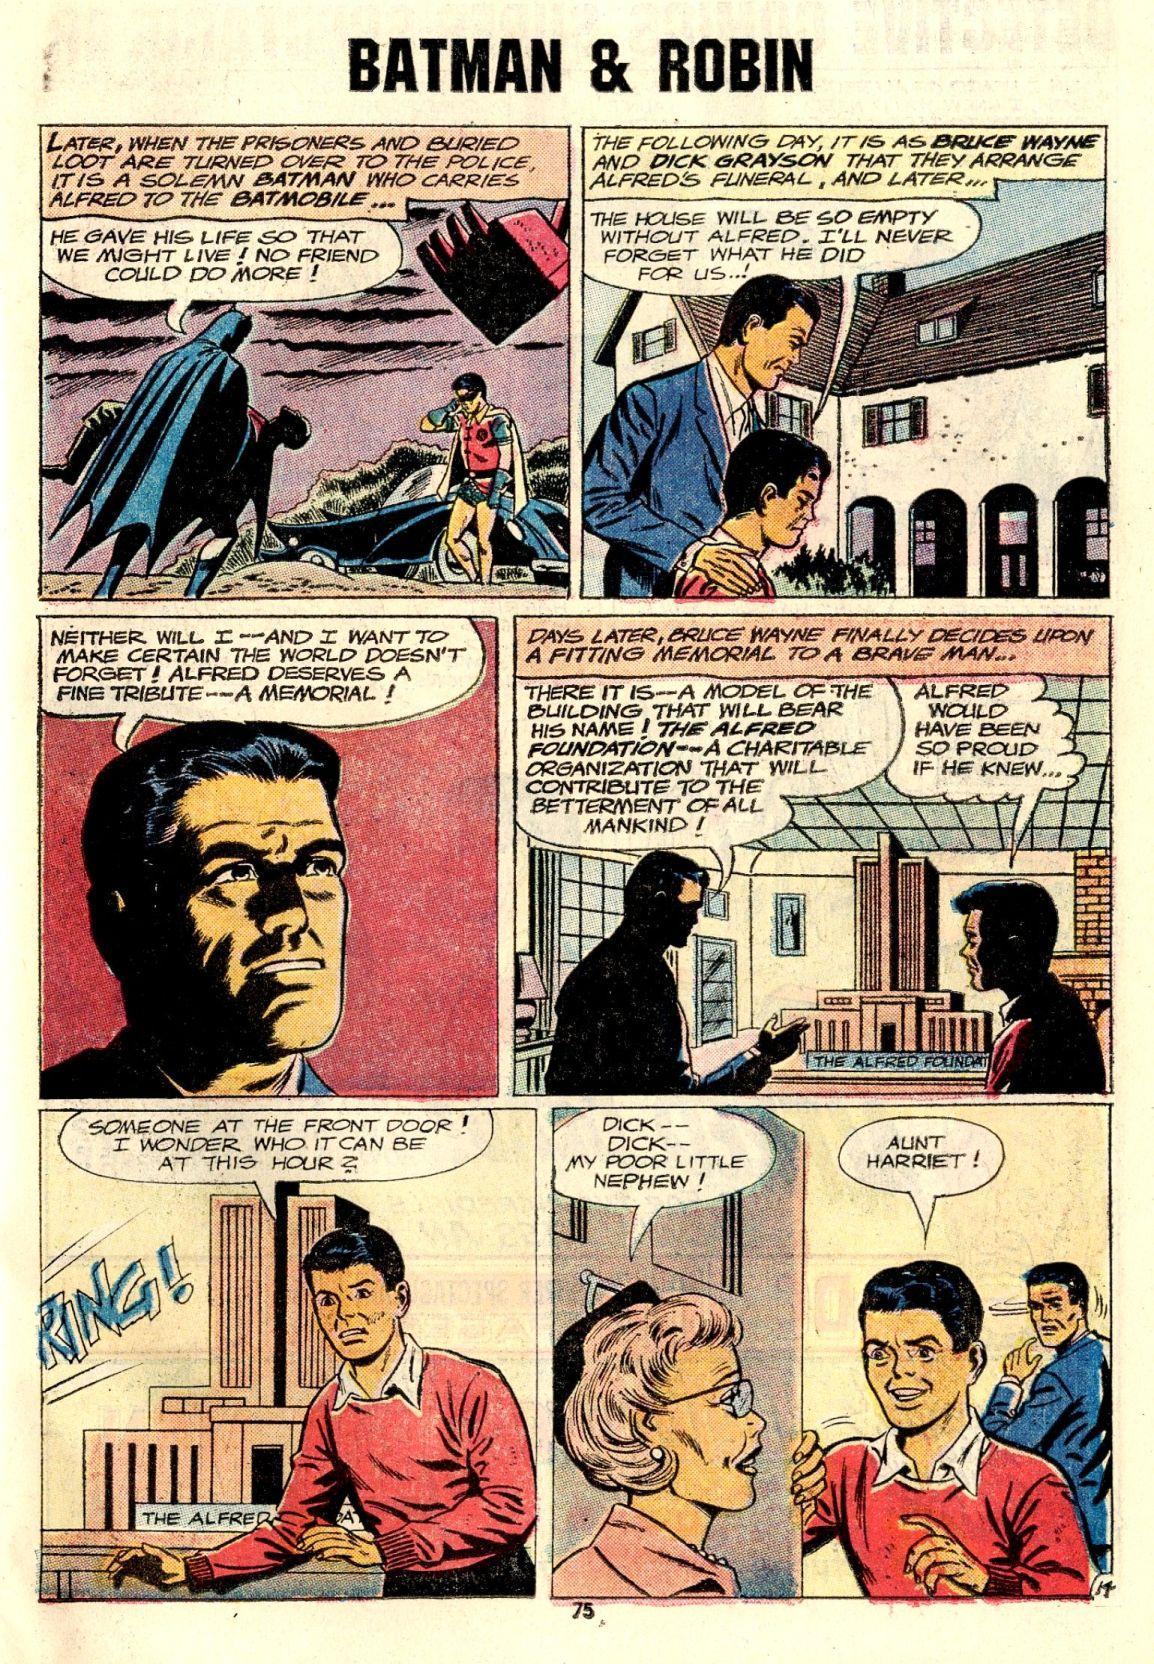 Detective Comics (1937) 438 Page 75